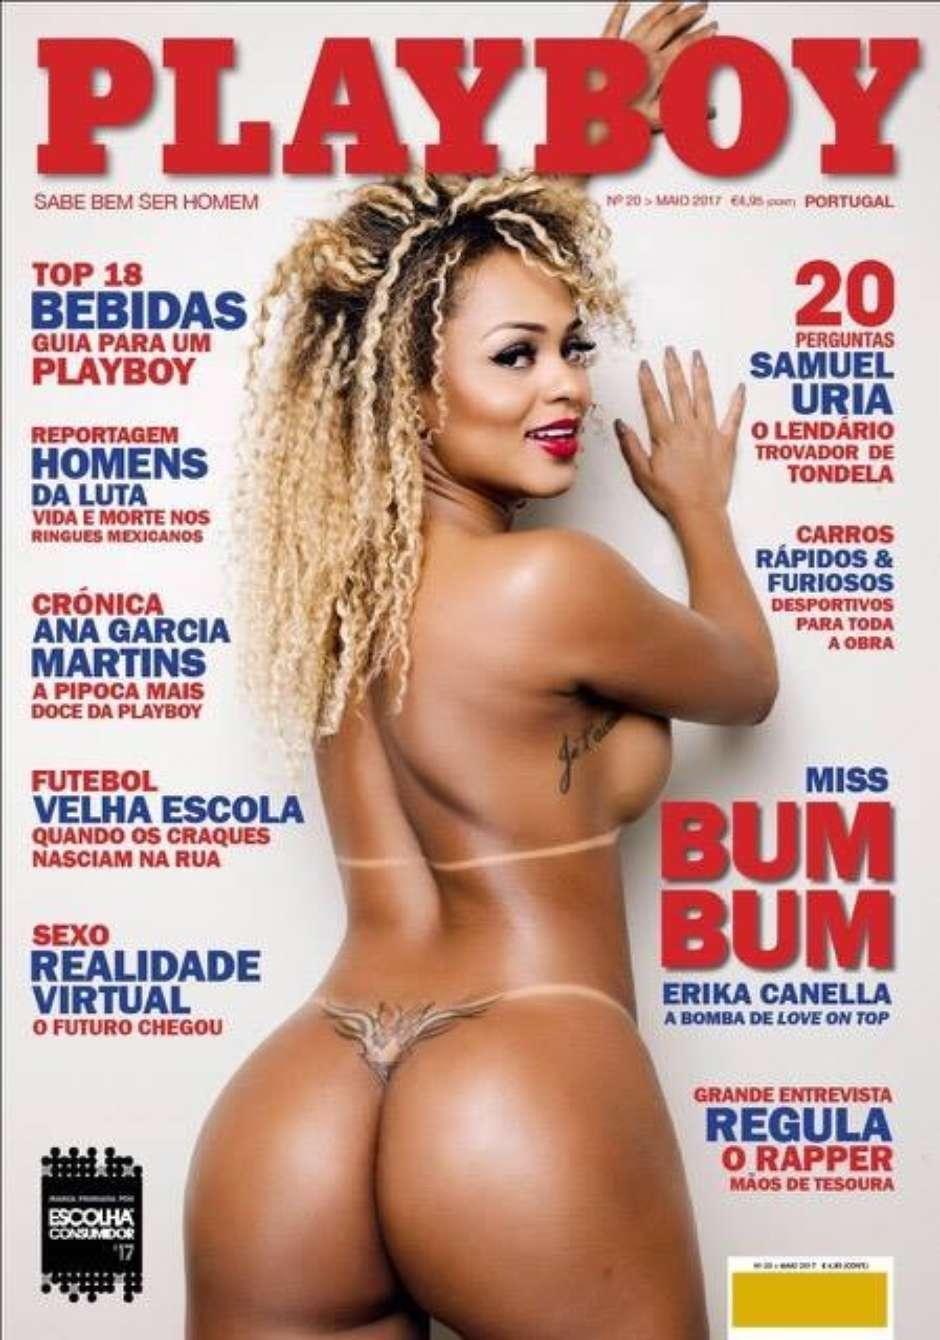 Erika Canella nua na revista da Playboy de Portugal